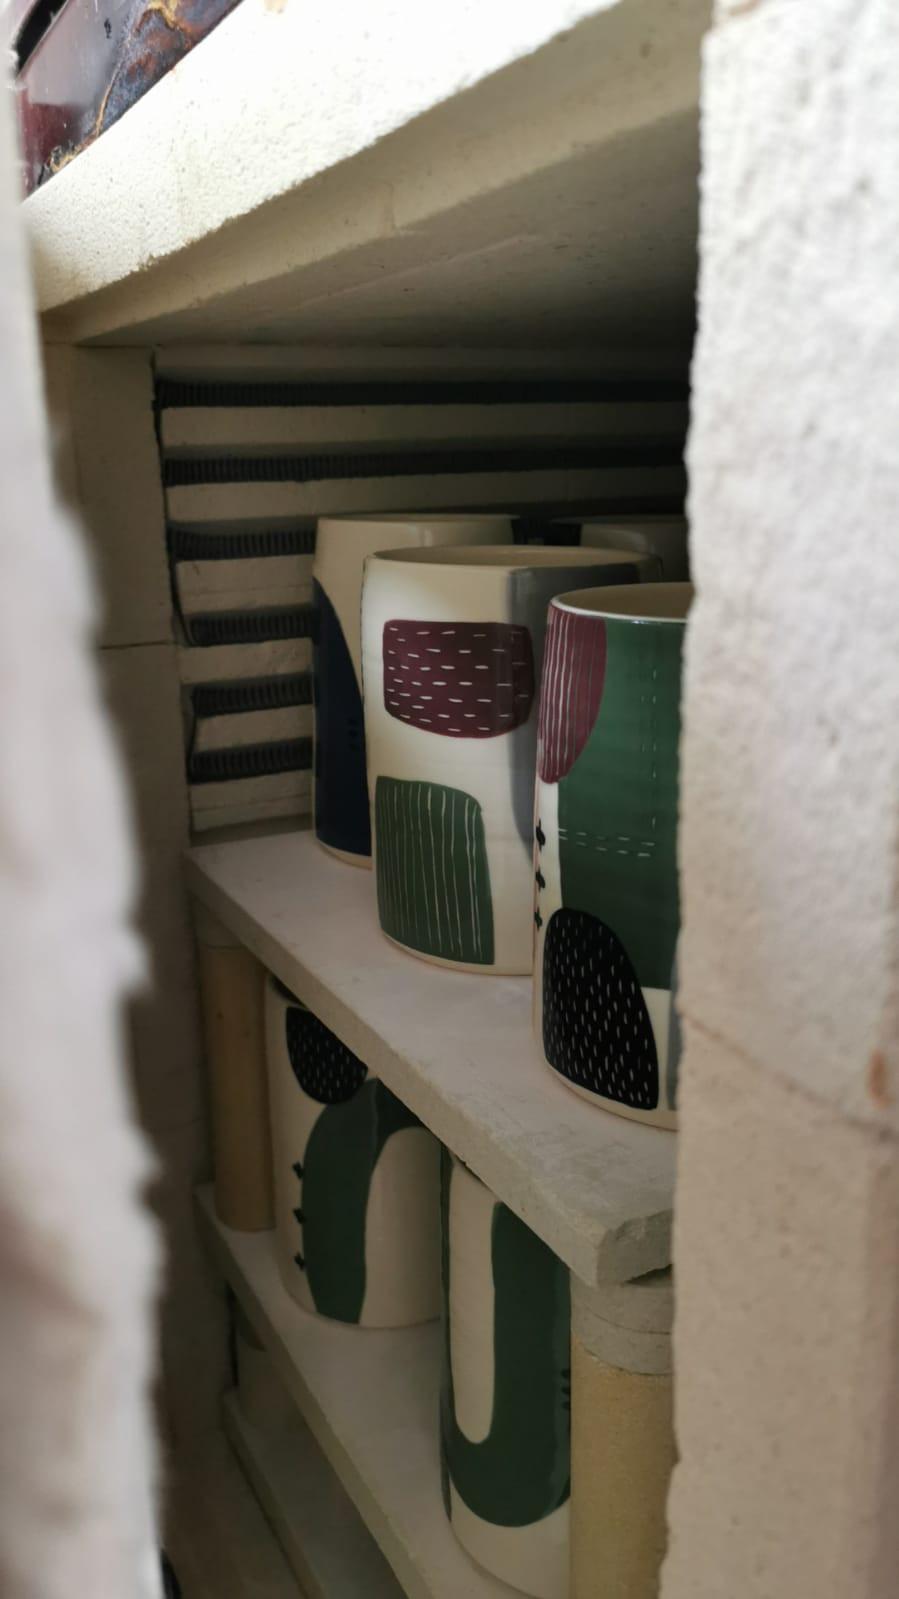 Glaze firing, kiln opening, ceramics